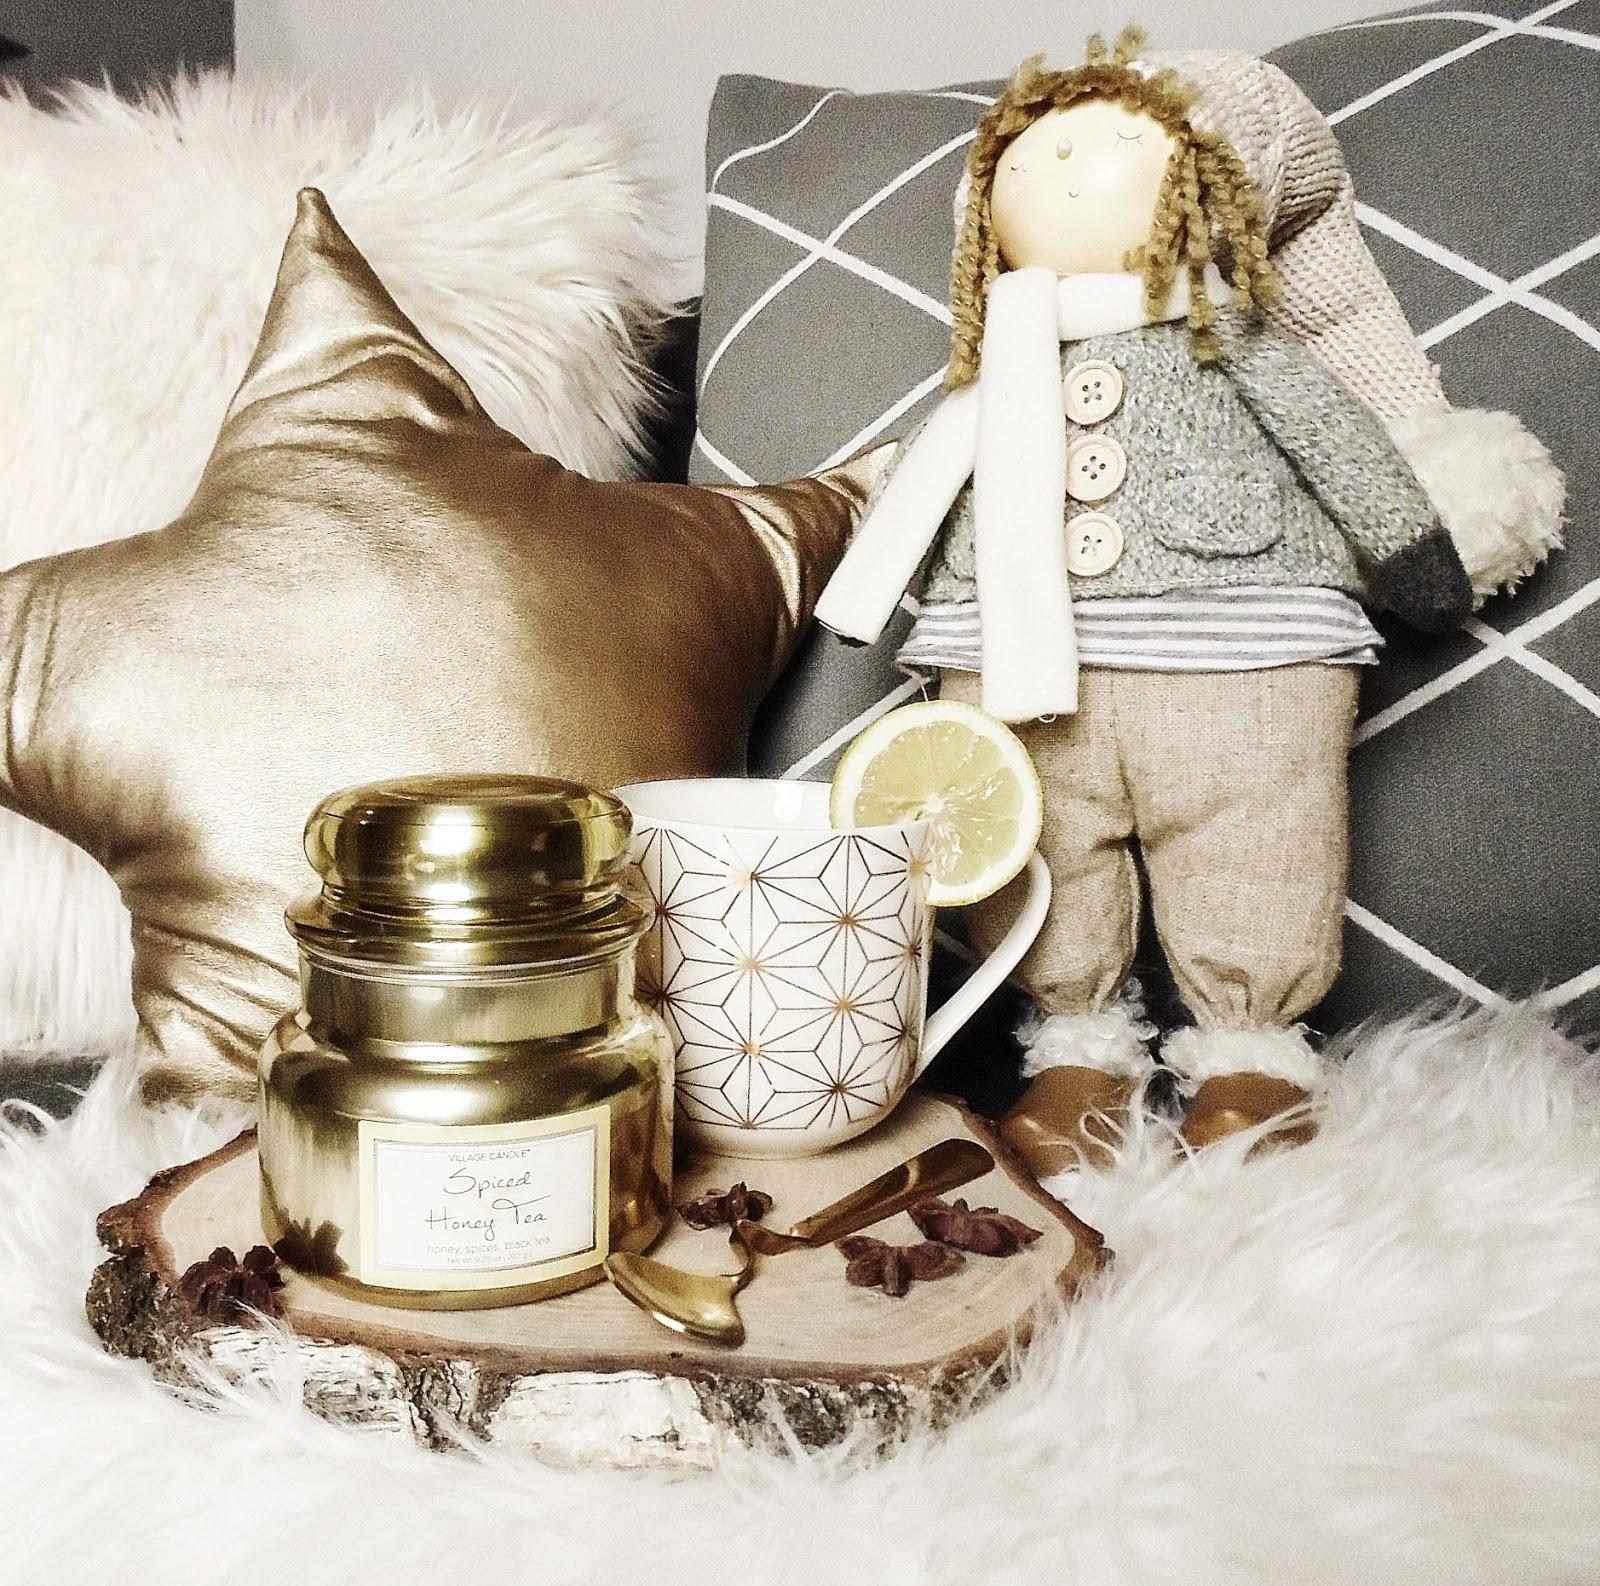 spiced honey tea village candle disco świeczki aromanti